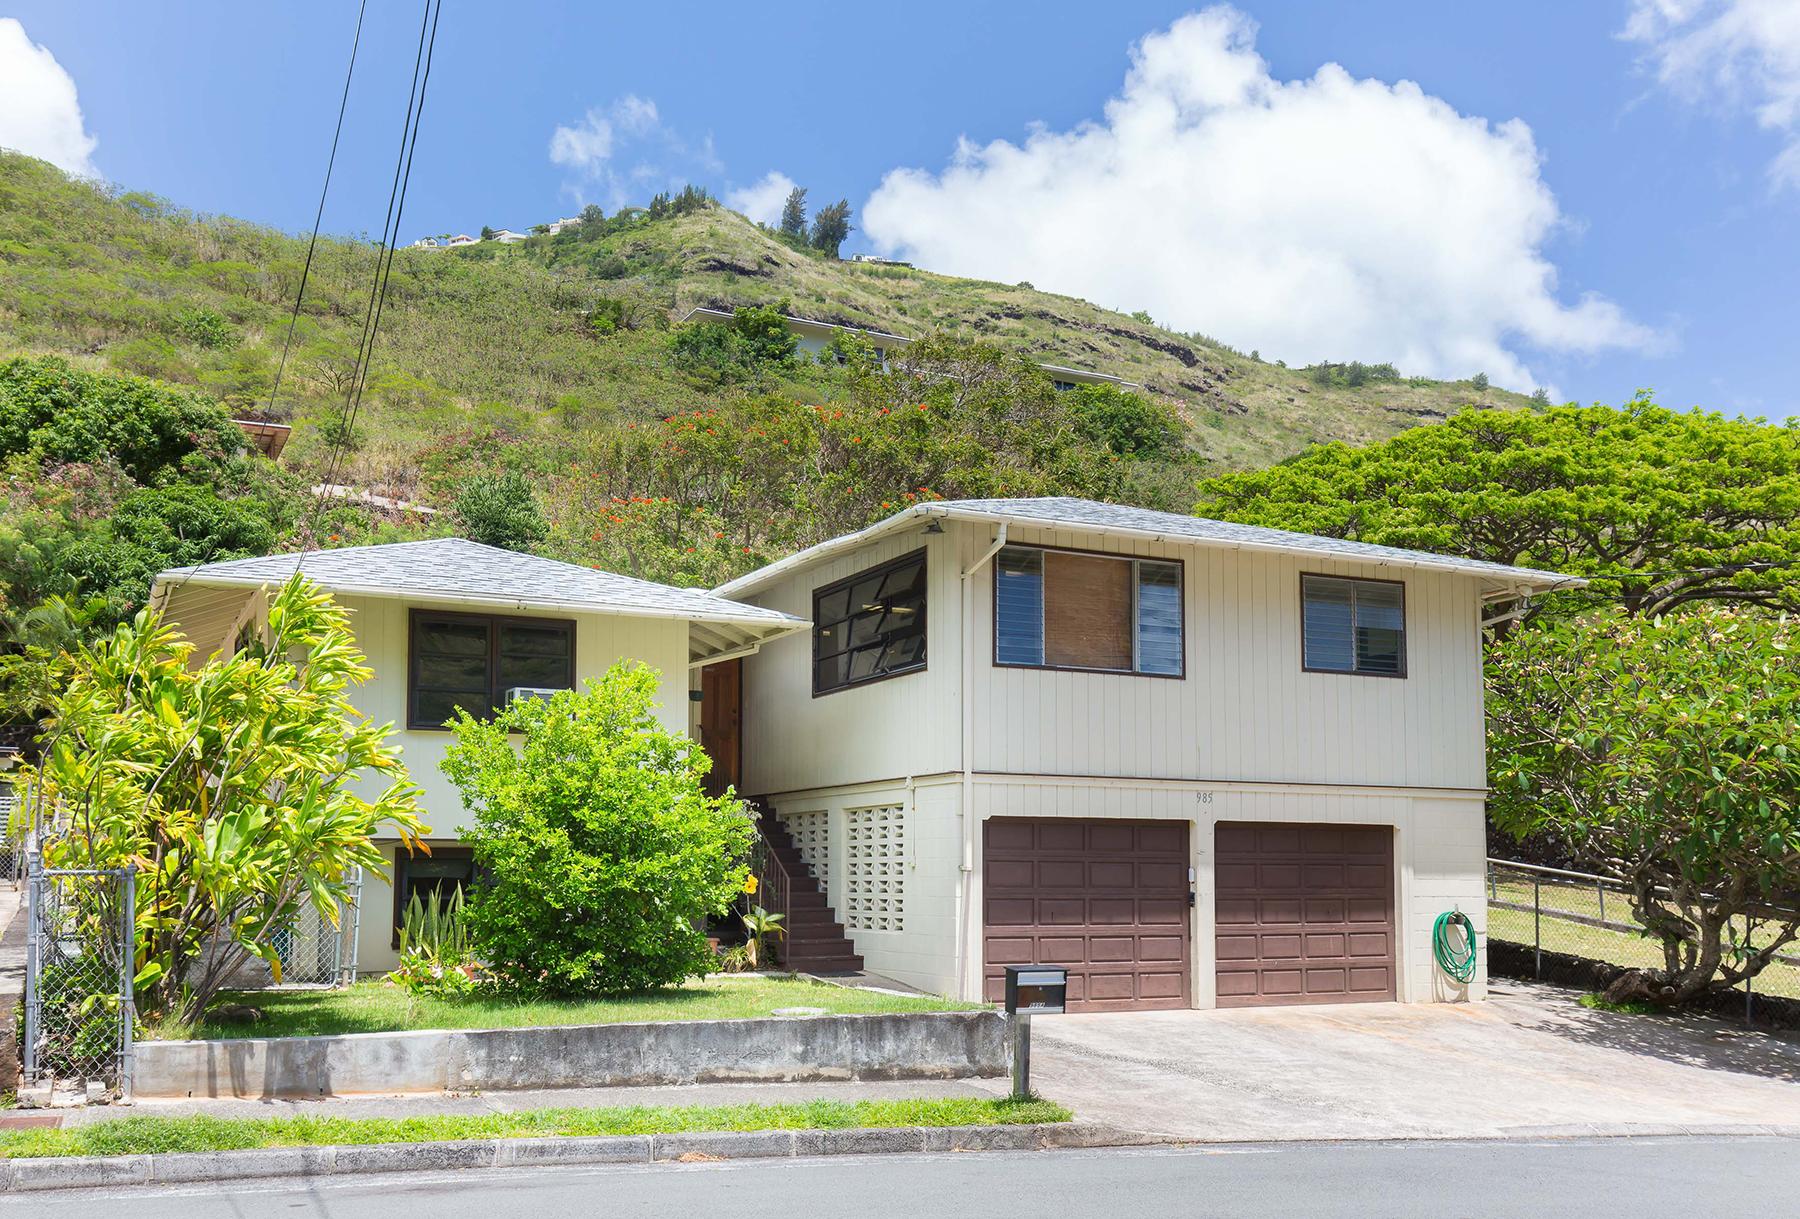 Moradia para Venda às Peaceful location with family unit 985 Hind Iuka Drive Honolulu, Havaí 96821 Estados Unidos